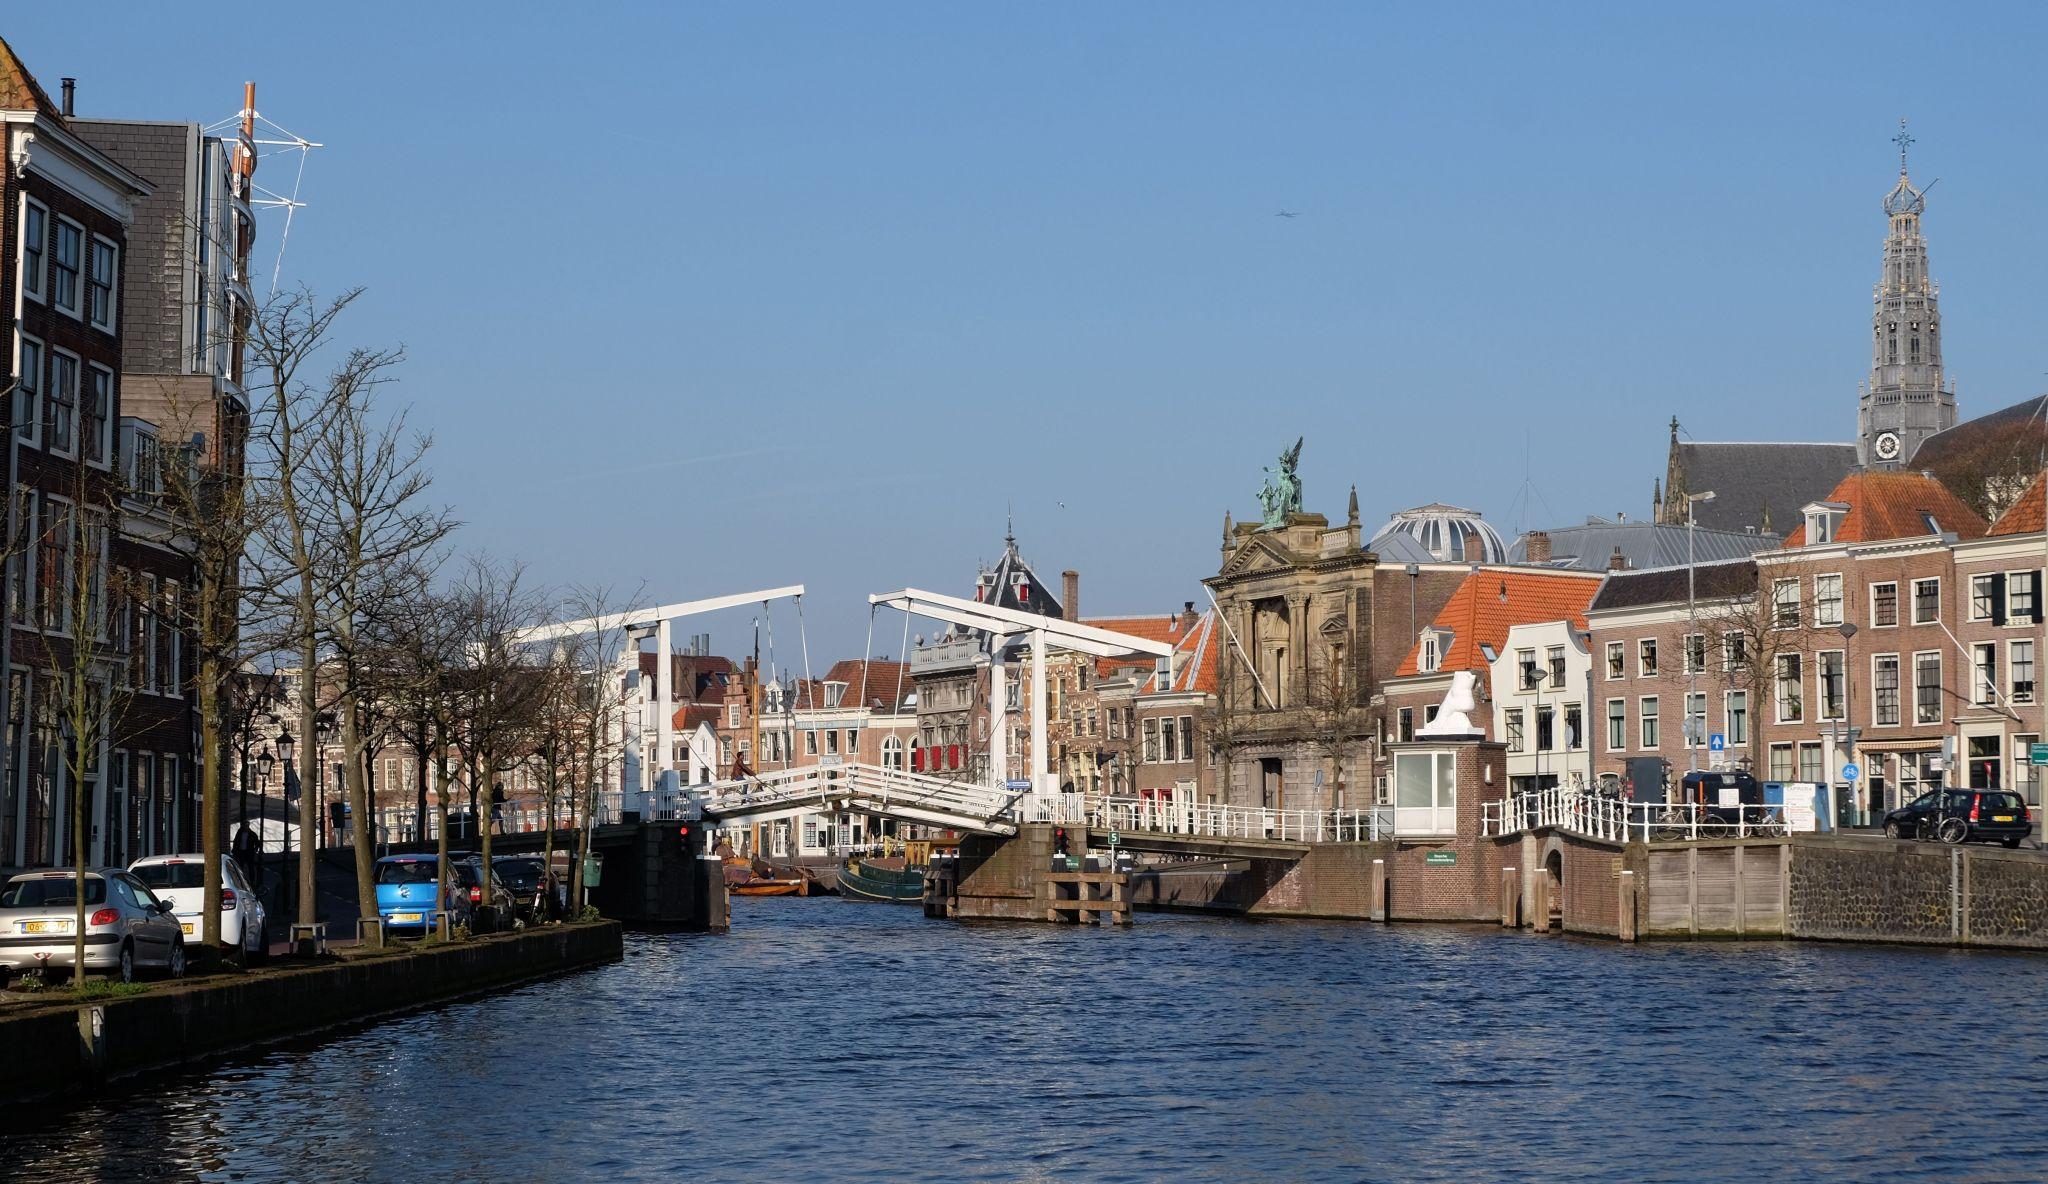 Gravestene Brug, Haarlem, Netherlands